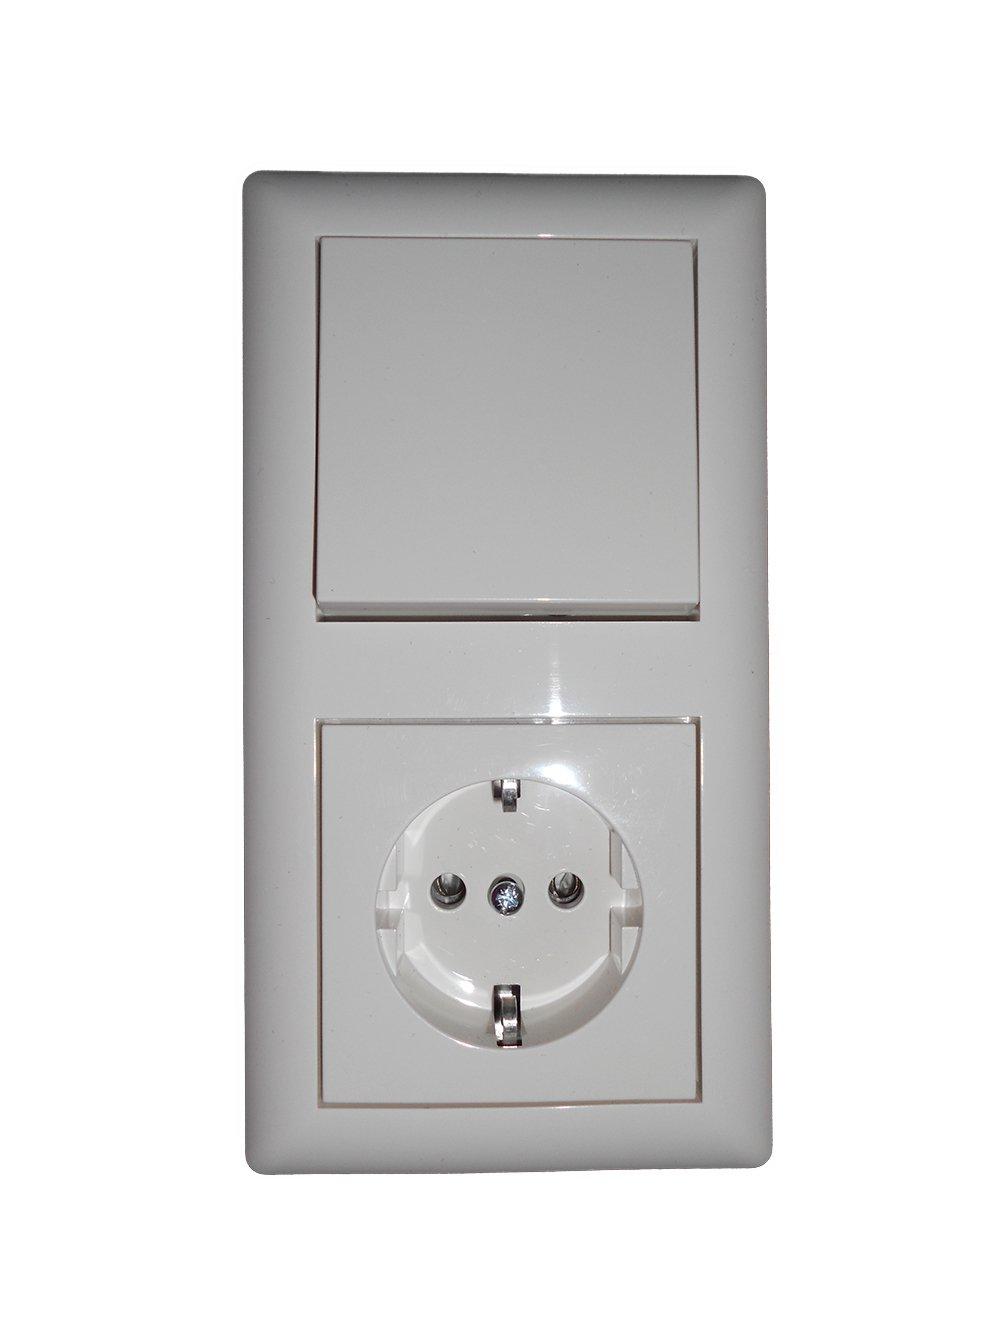 2 Stck.Lichtschalter/Steckdosen TP 55 - 2-fach Kombination komplett ...